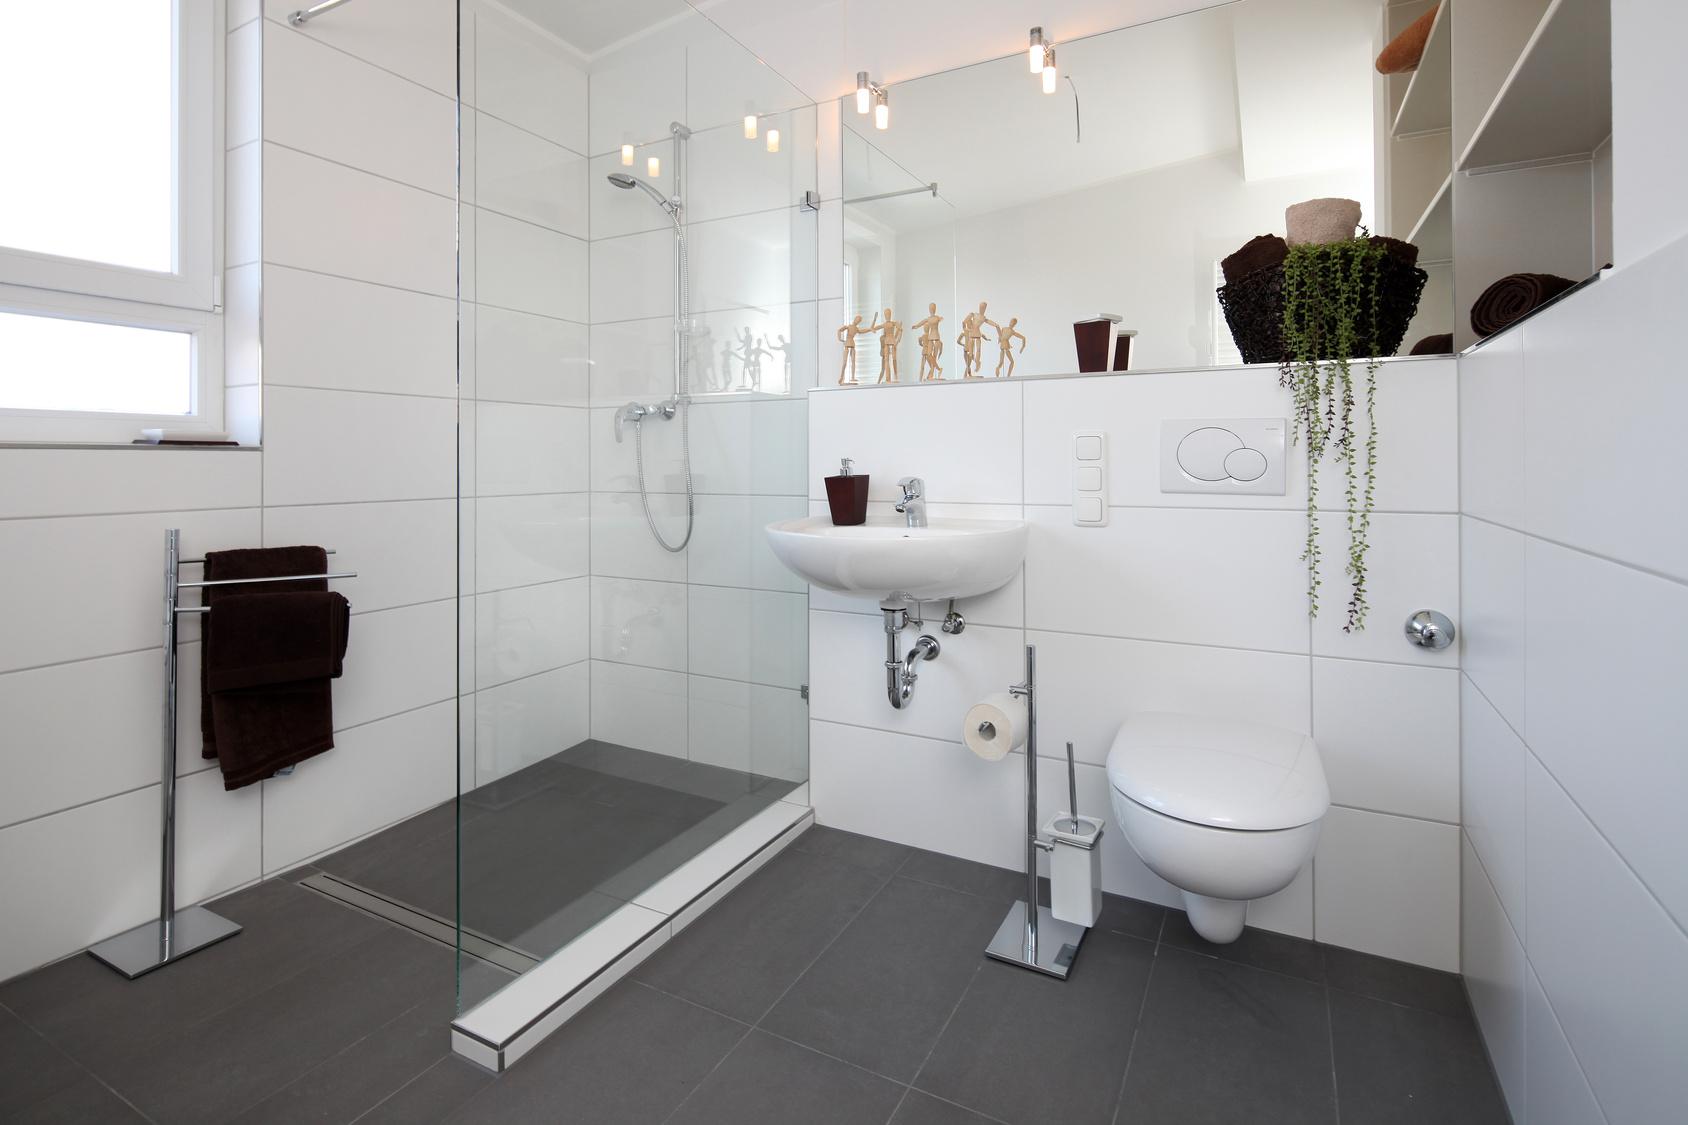 Badezimmer Sanierung | zumadler.com